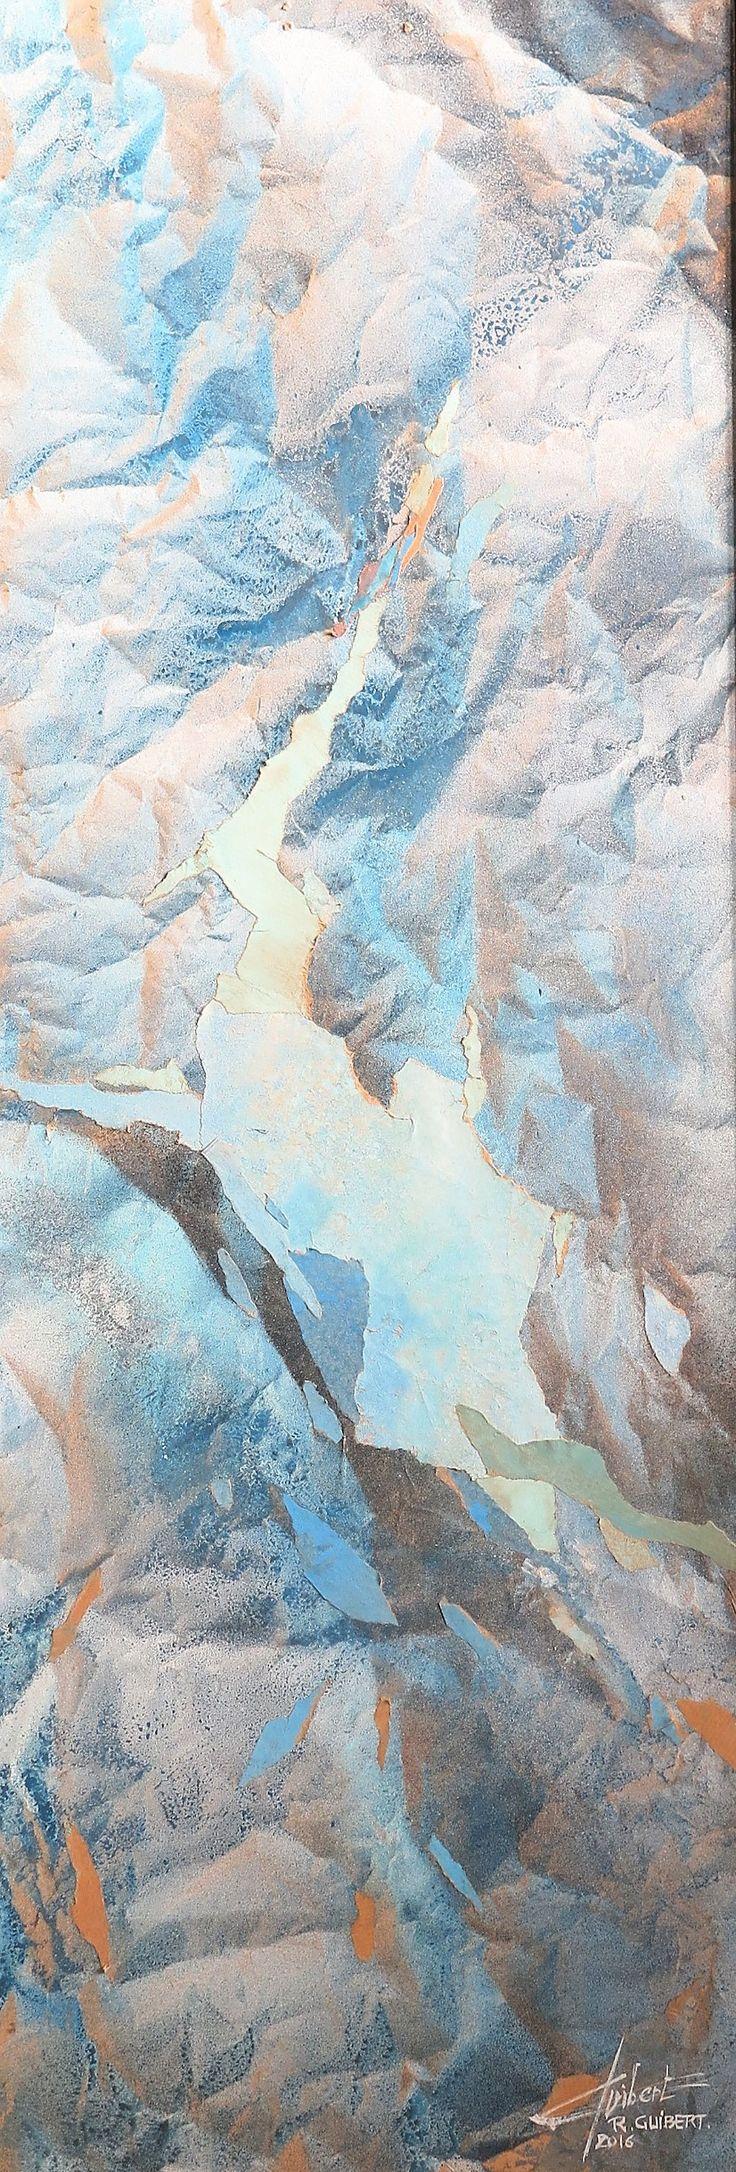 AQUARELLE sur papier kraft 32 x 95 cm Raymond GUIBERT 2016.